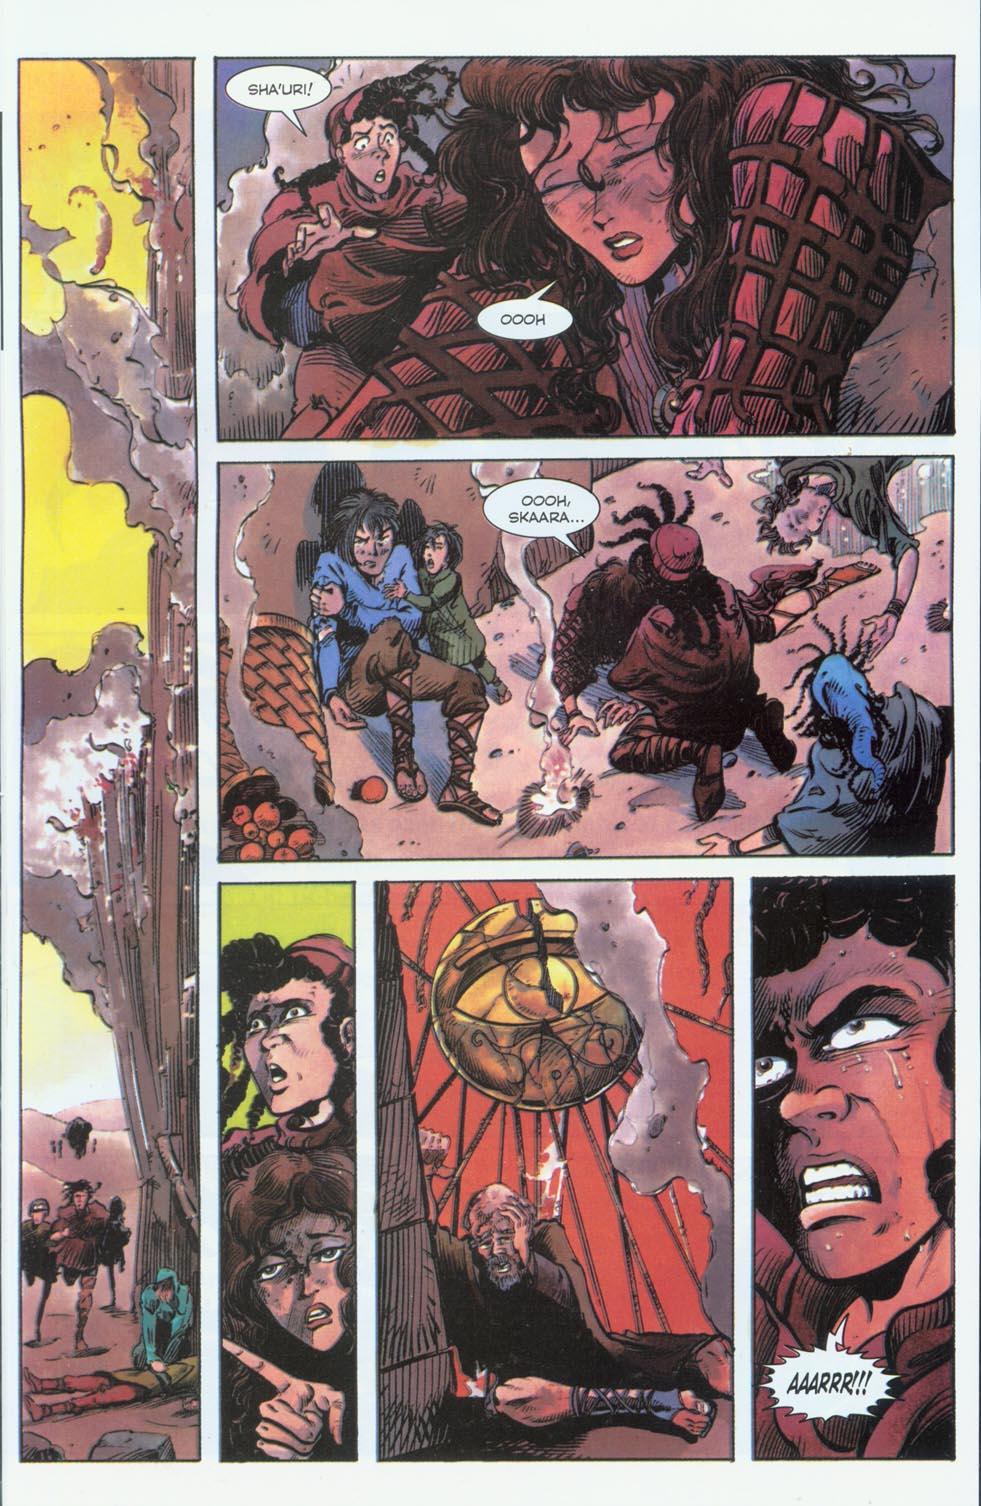 Read online Stargate comic -  Issue #3 - 11